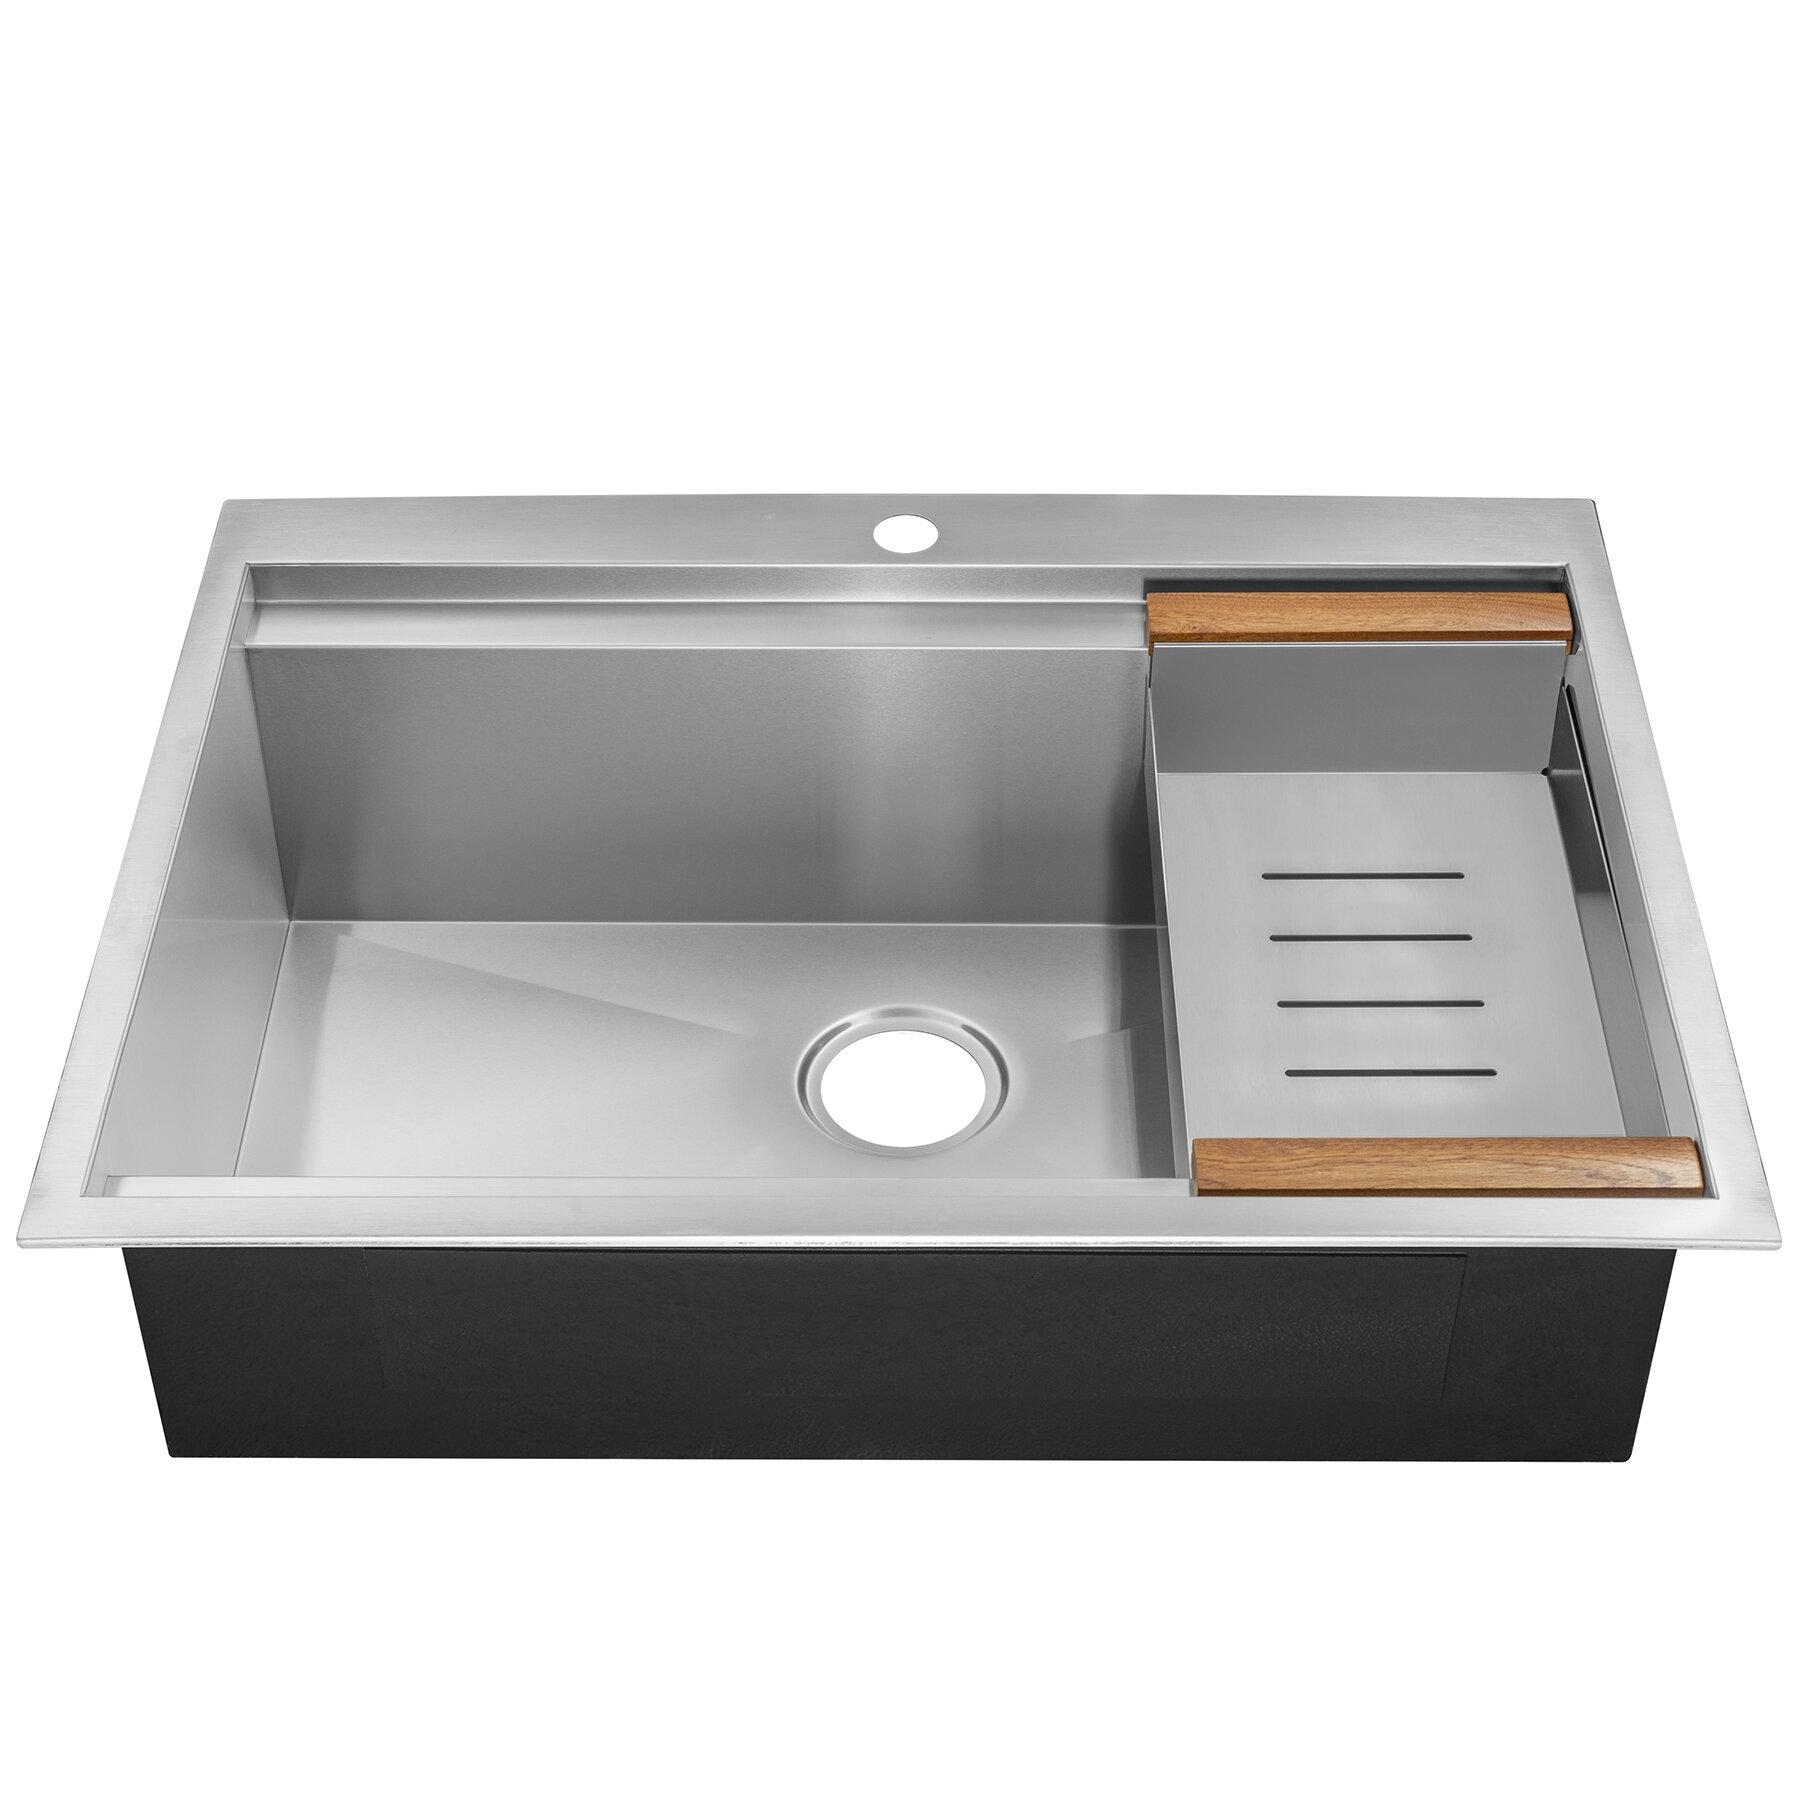 30 X 22 Drop In Top Mount Stainless Steel Single Bowl Kitchen Sink W Tray Reviews Allmodern